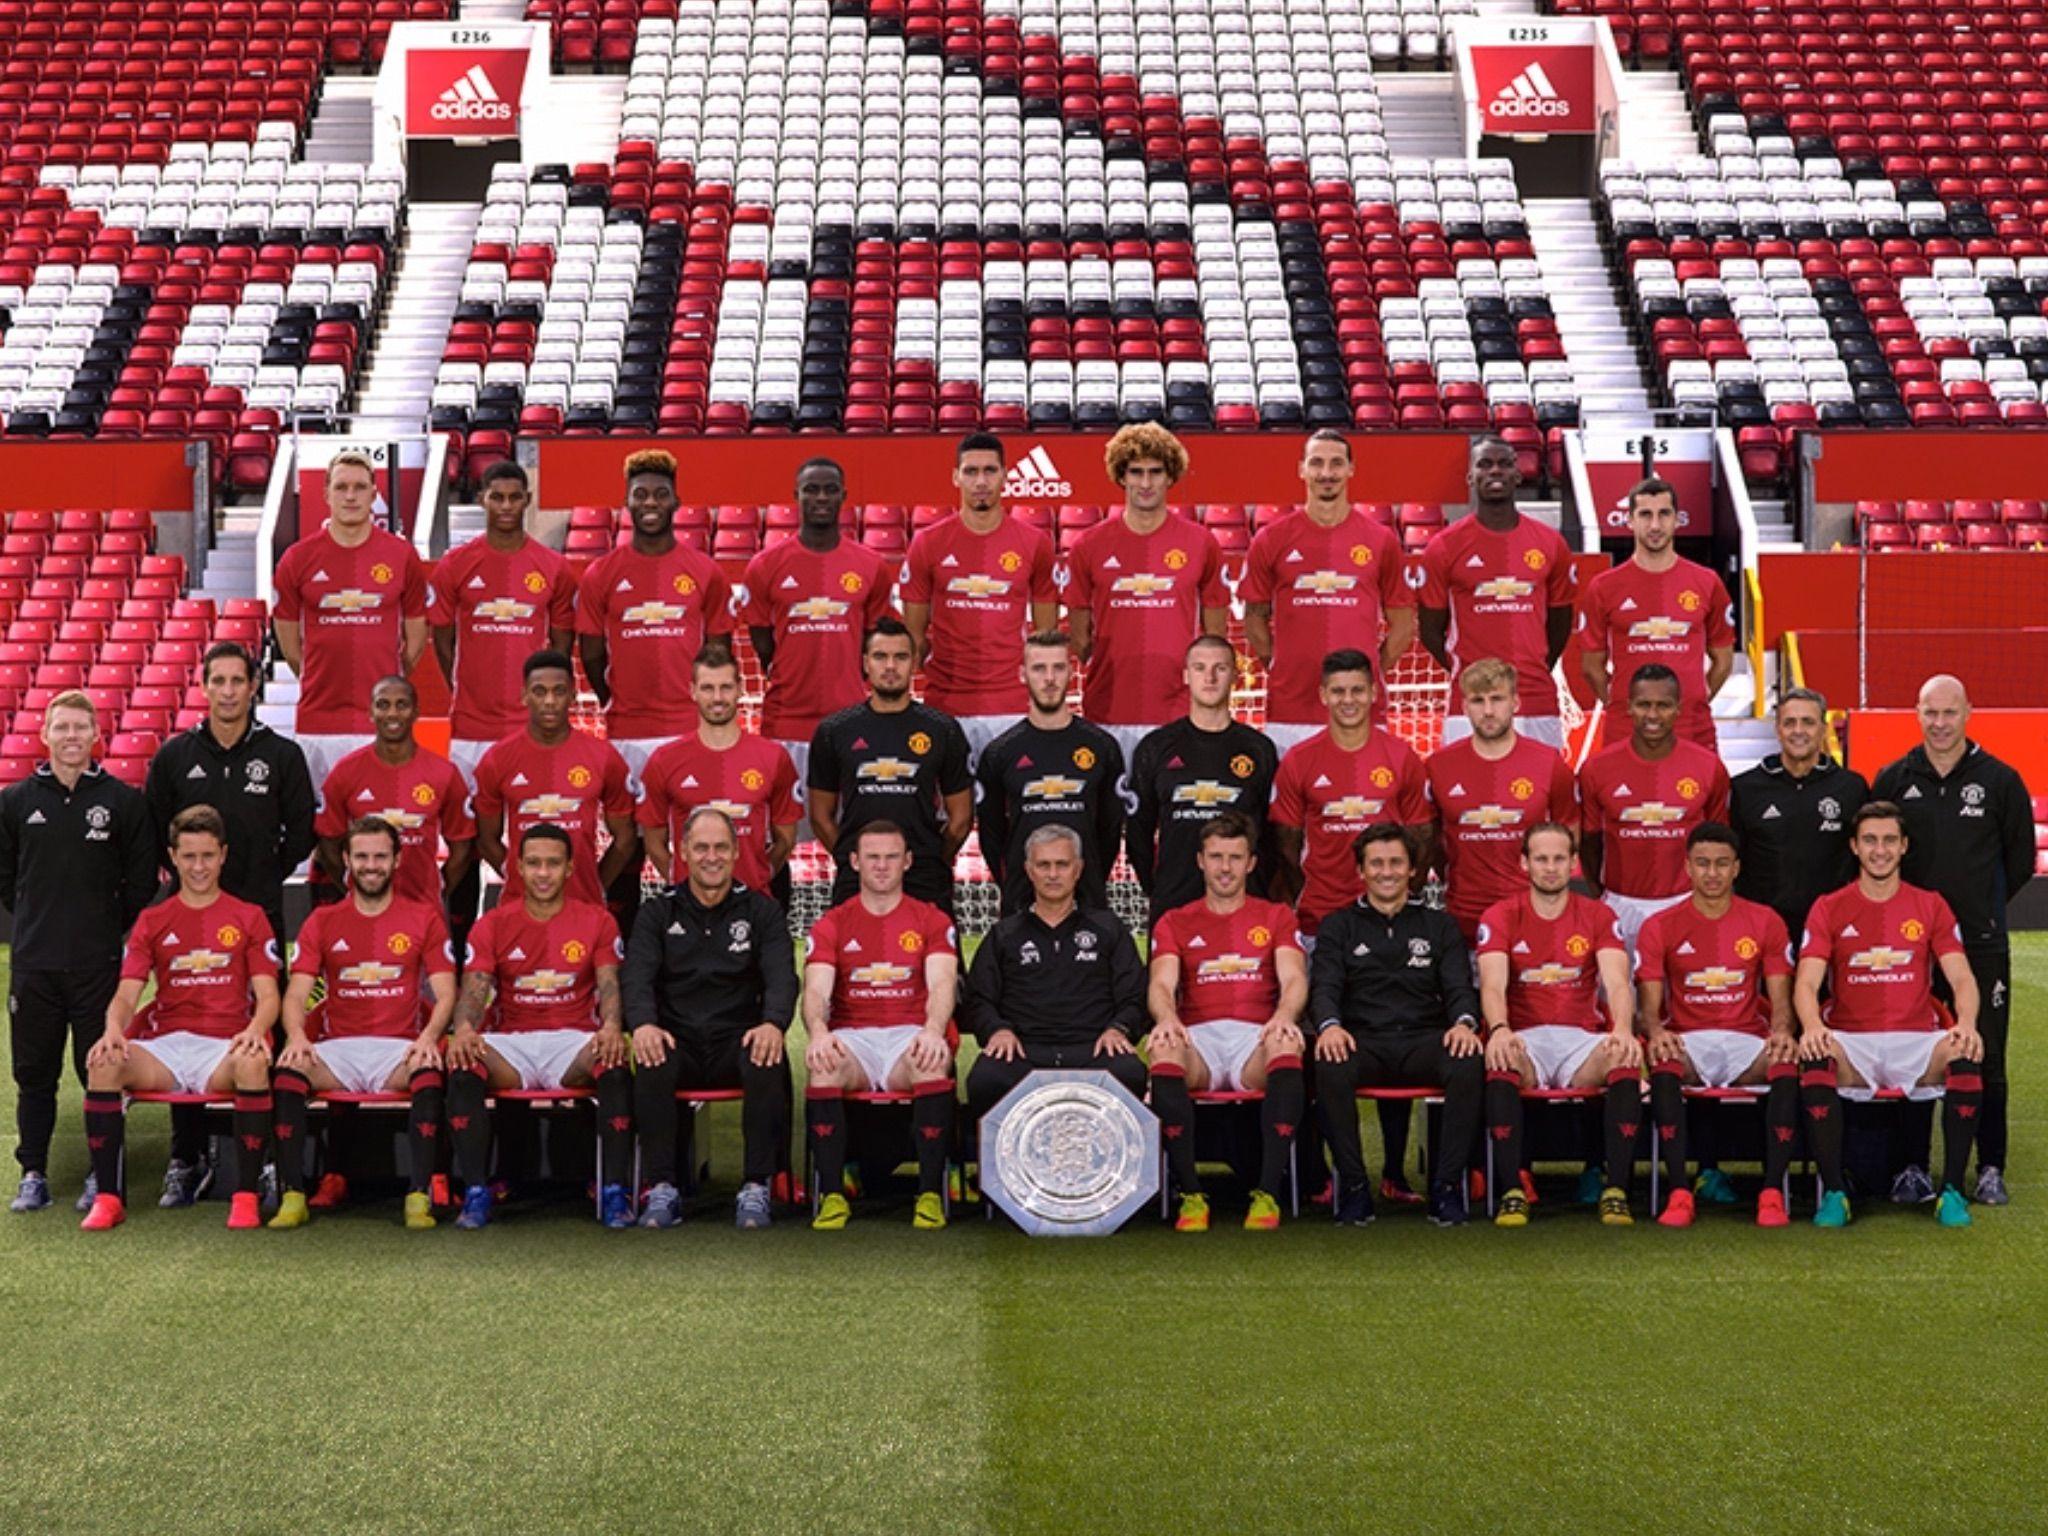 Manchester United 2016/17   Manchester united, Manchester united football  club, Manchester united team